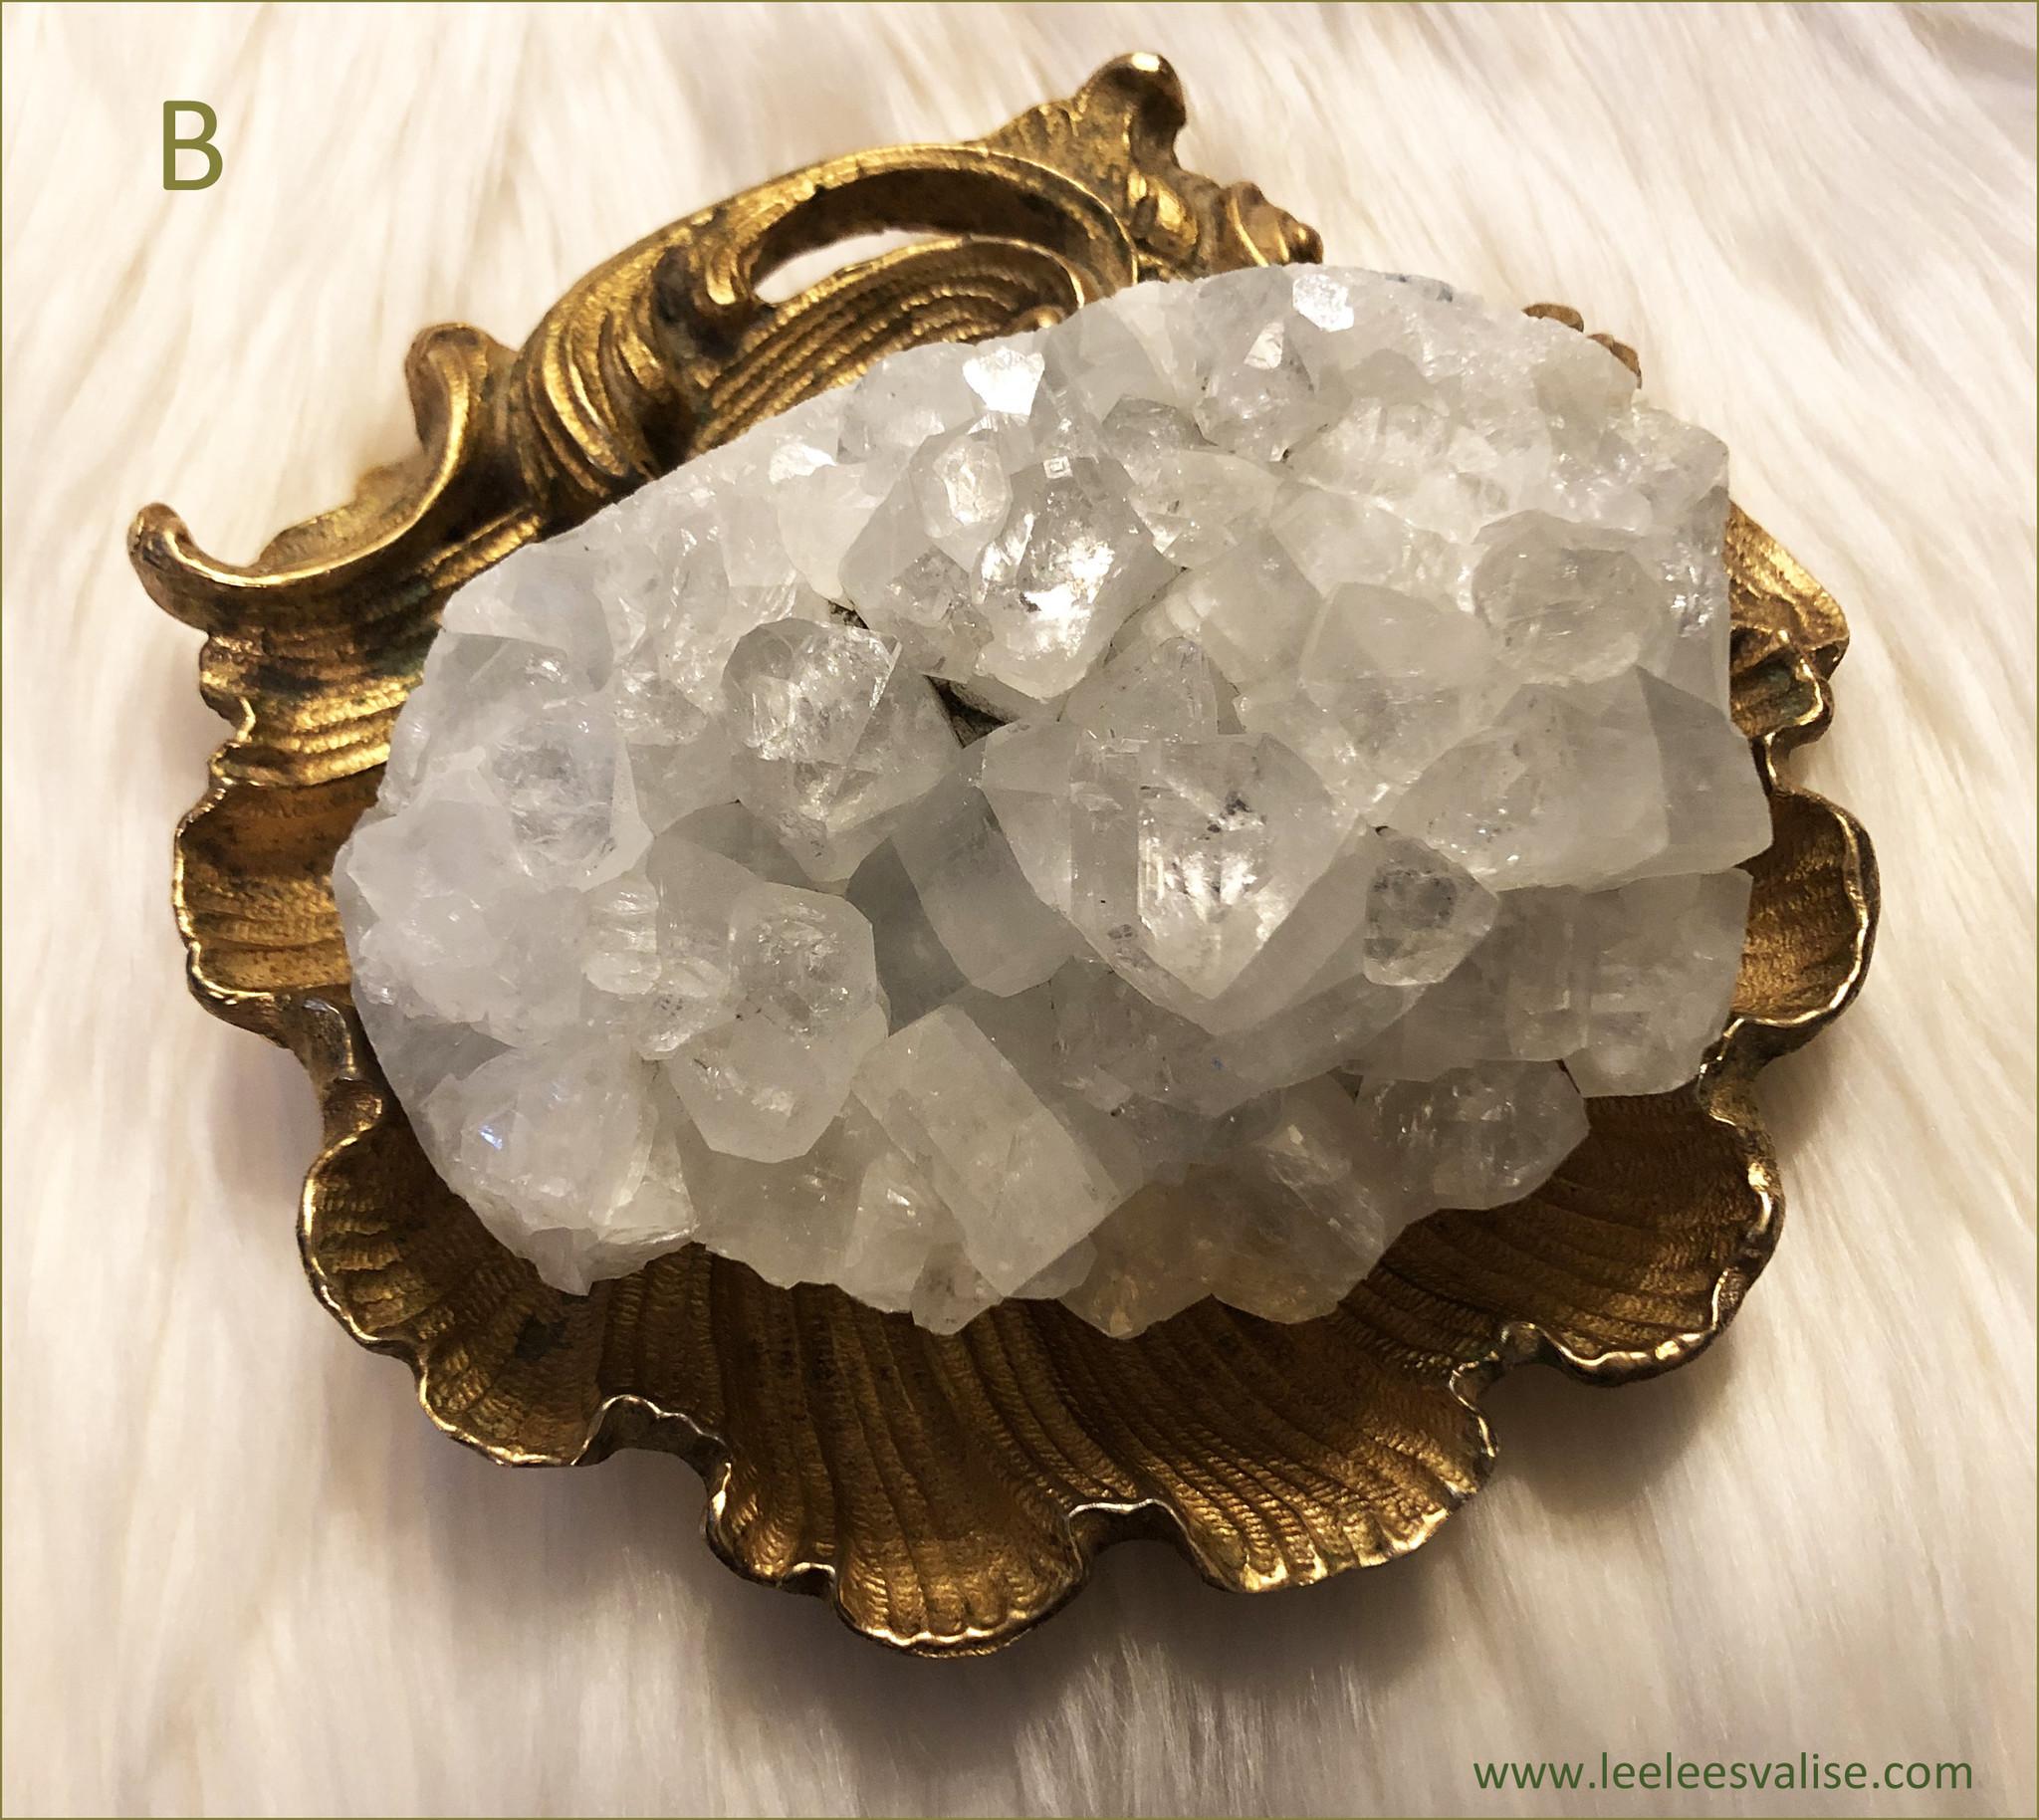 Apophyllite Crystal Cluster B